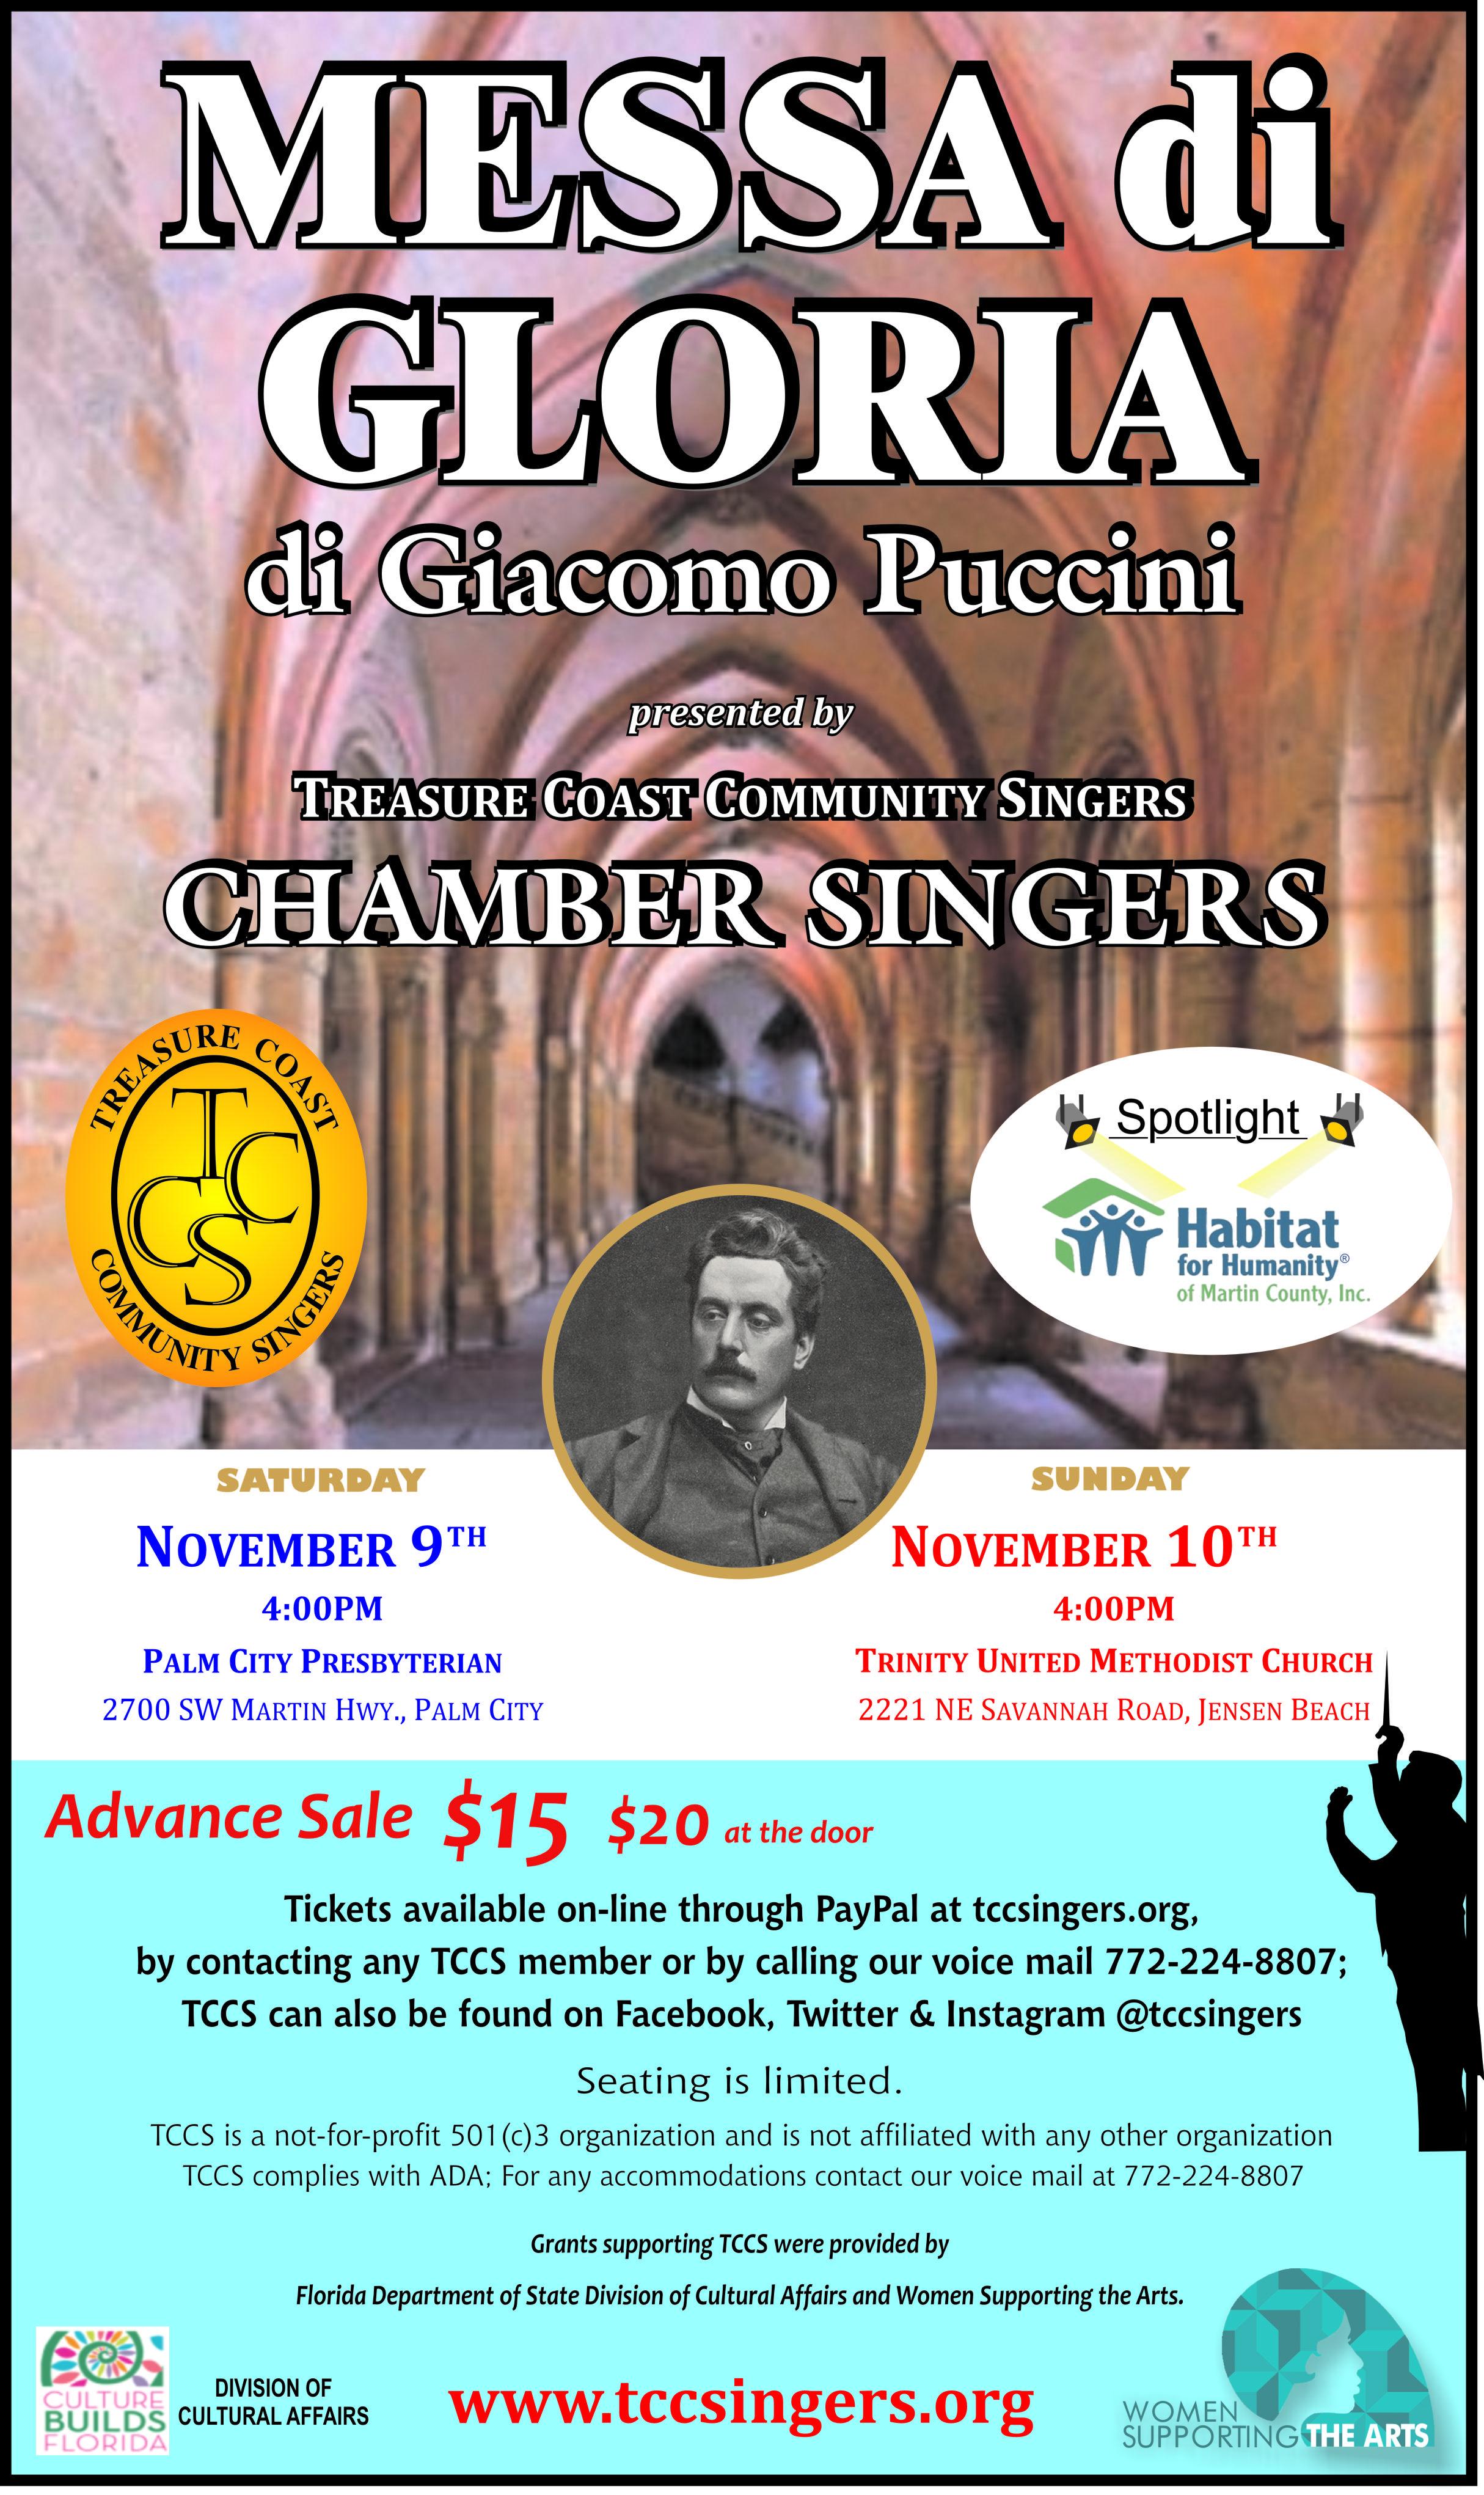 Treasure Coast Community Singers Chamber Singers presents Messa di Gloria